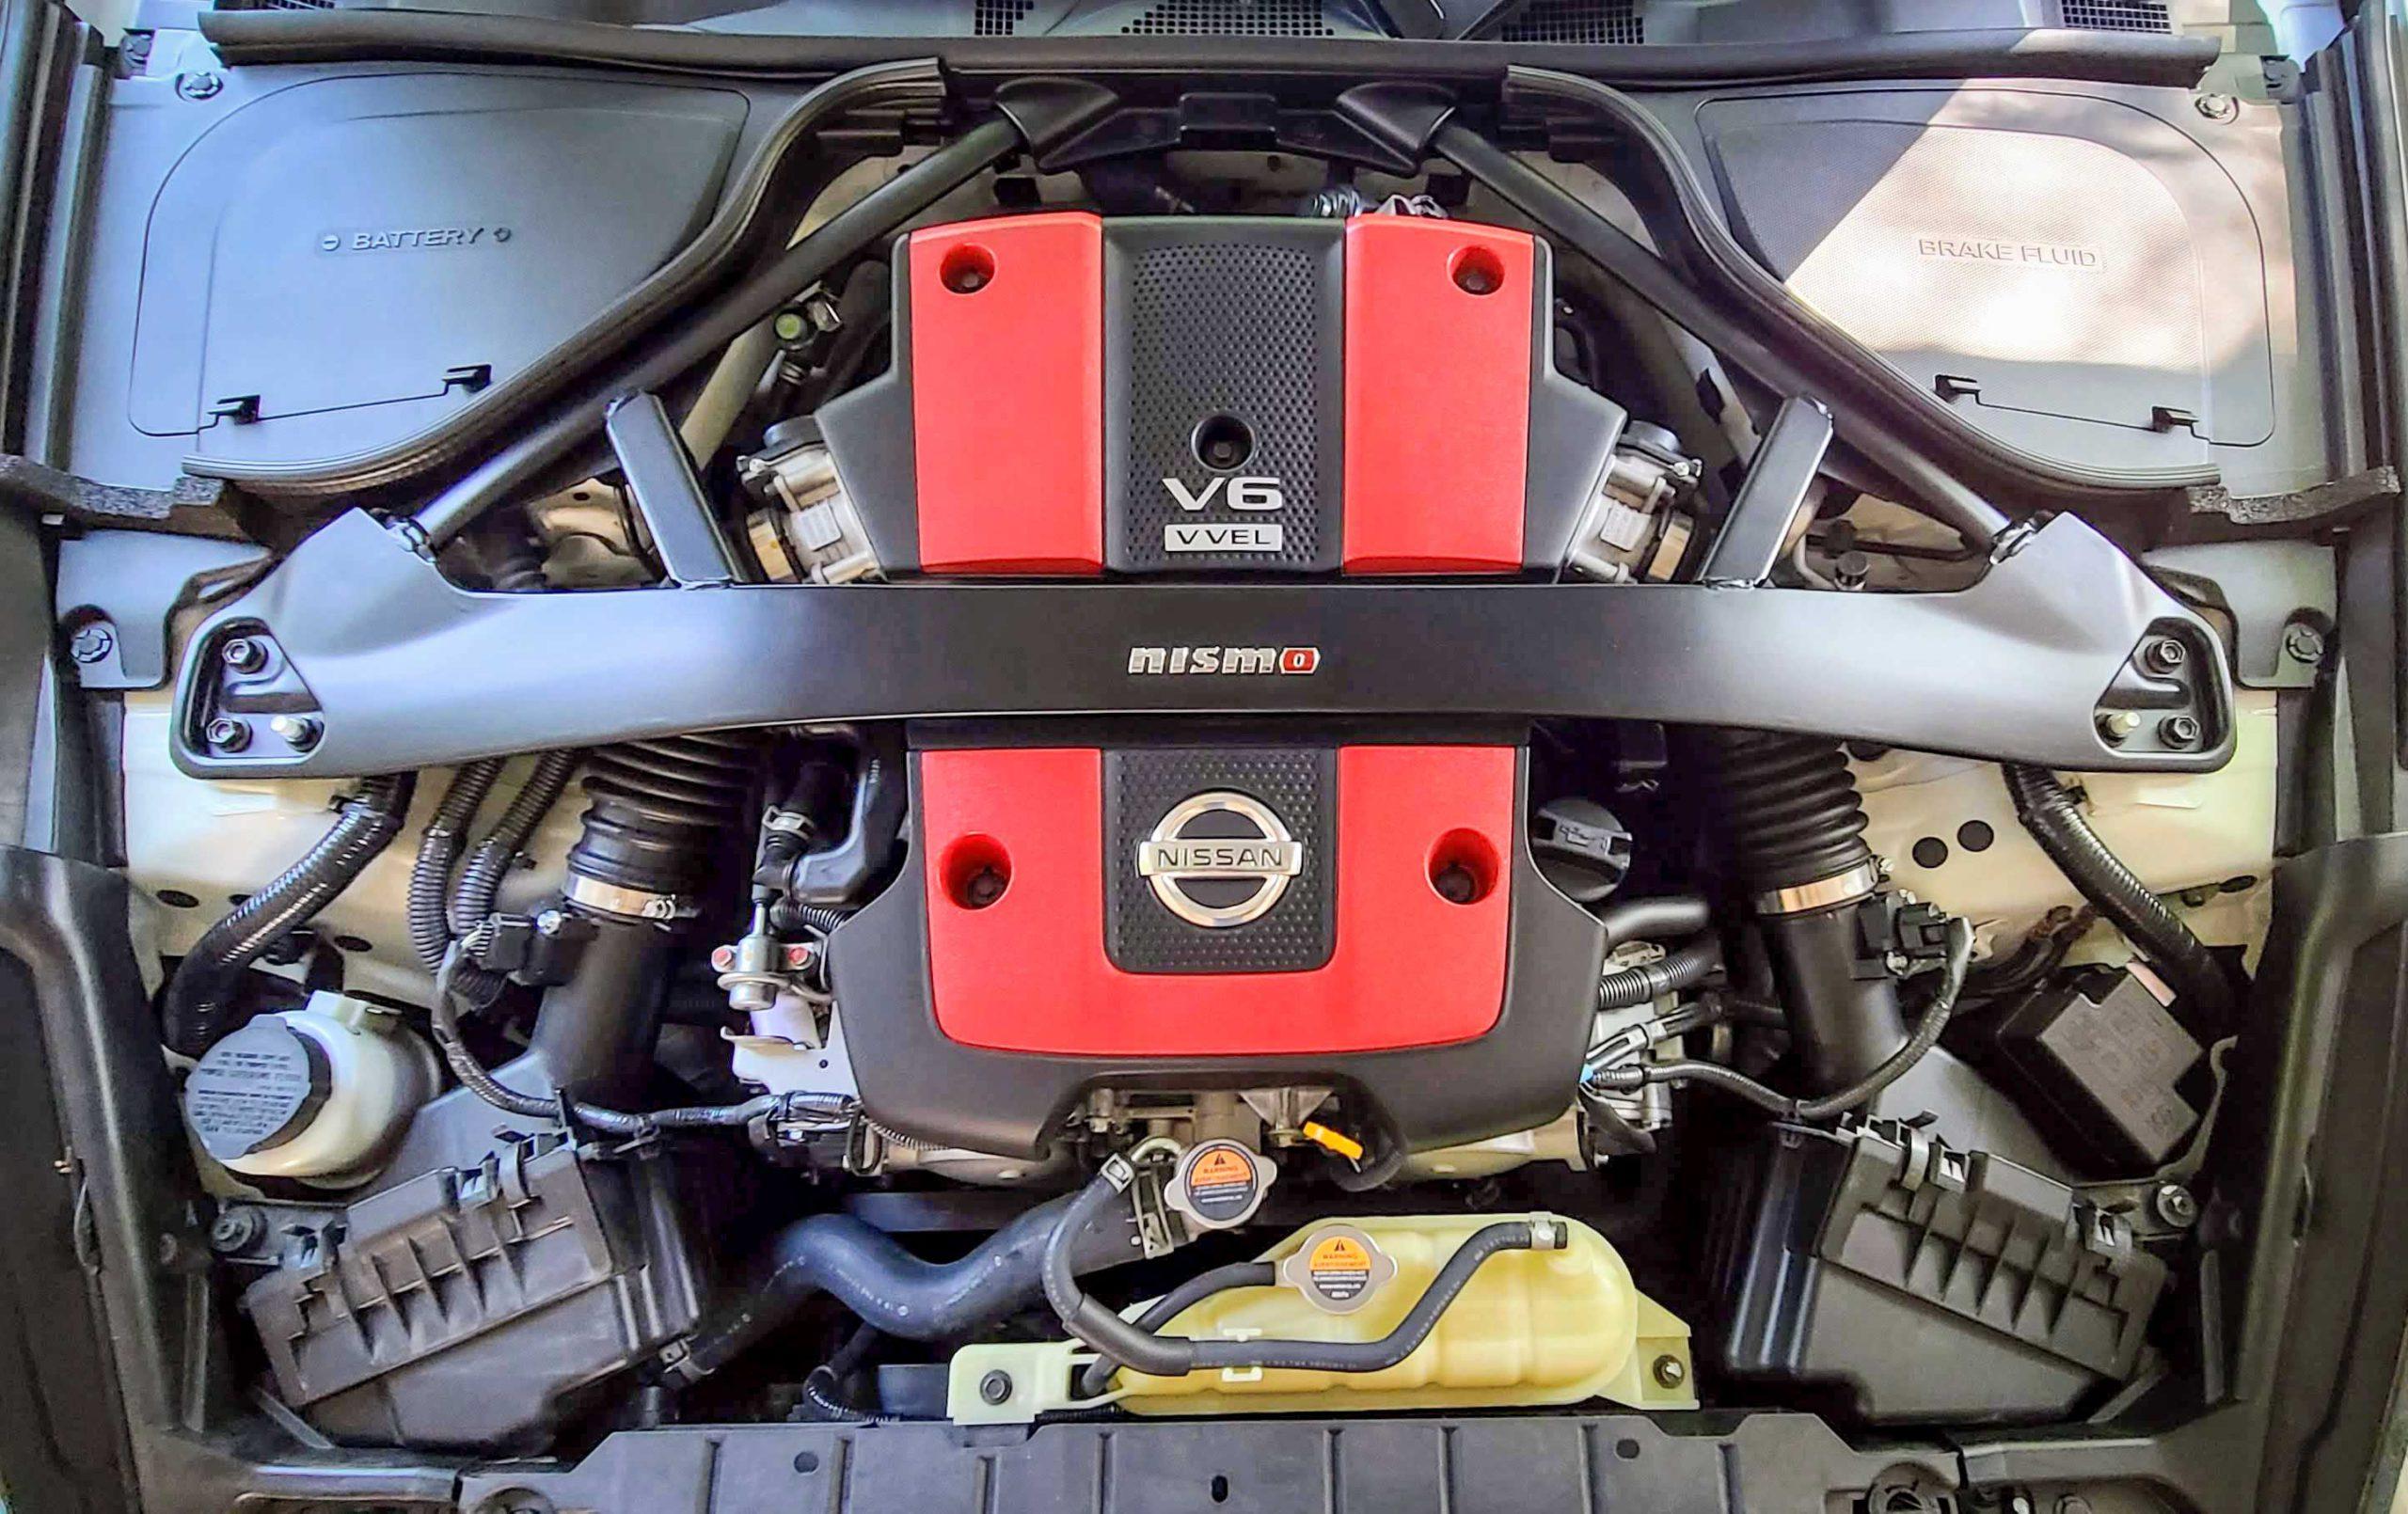 The 2020 Nissan 370Z Nismo's 3.7-liter engine.